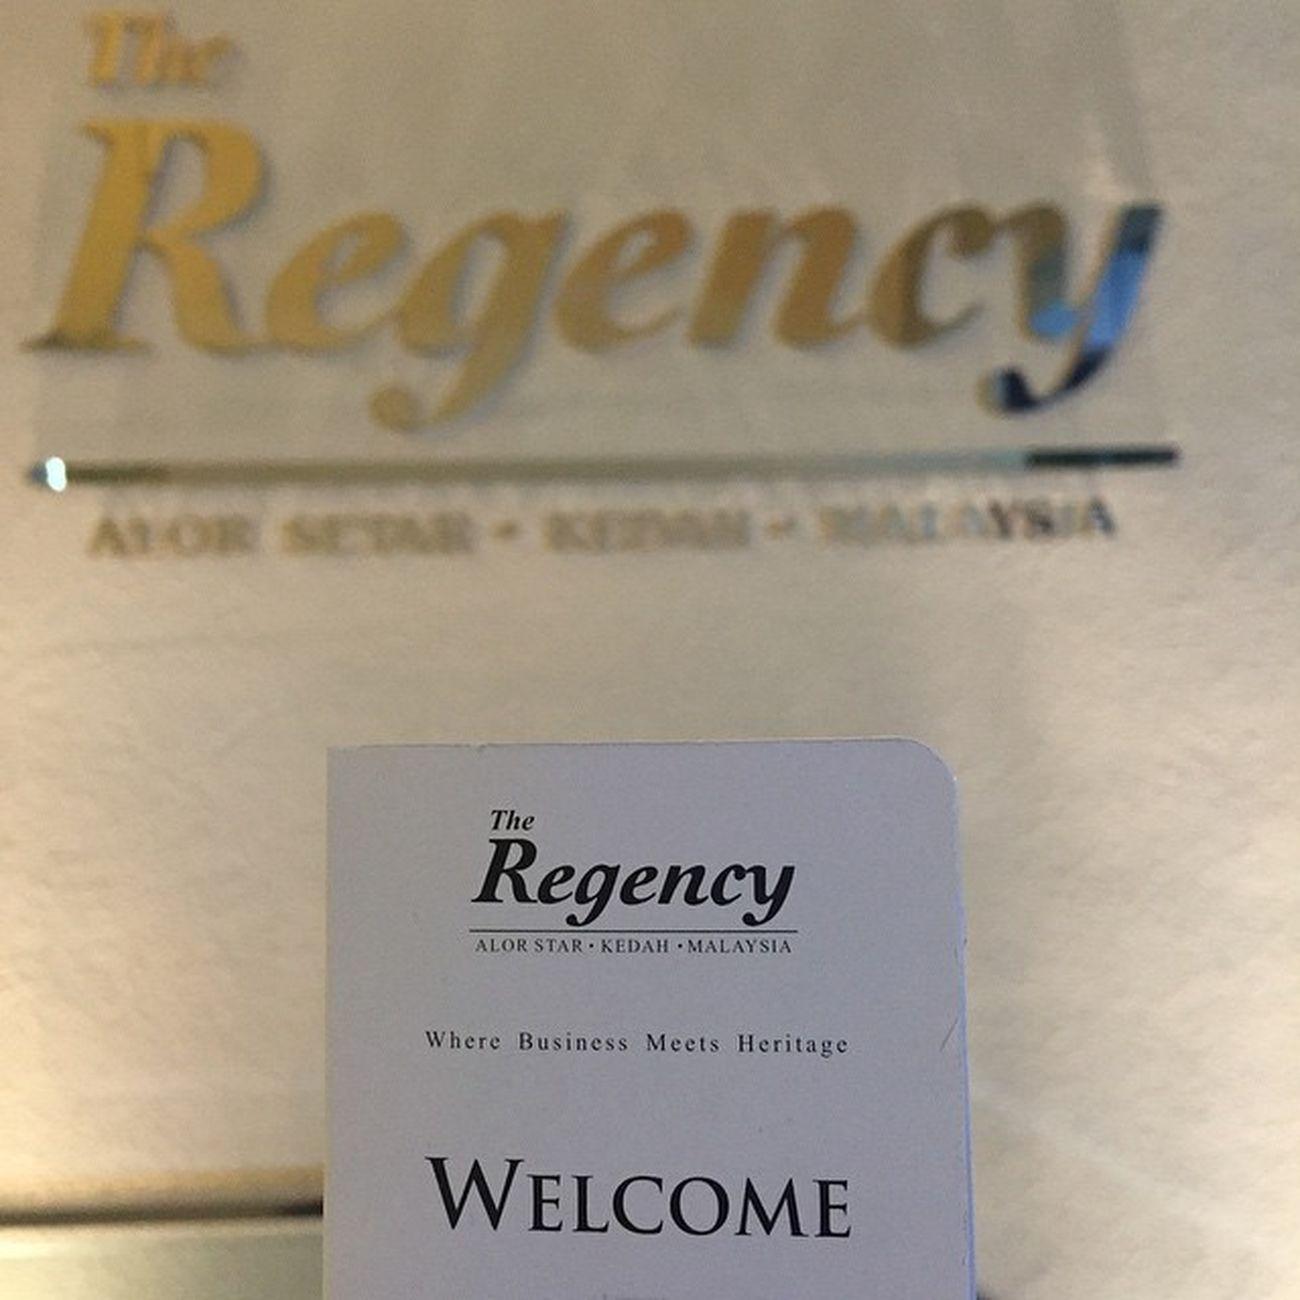 Merehatkan diri... Rest Regency Hotel Alorstar malaysia